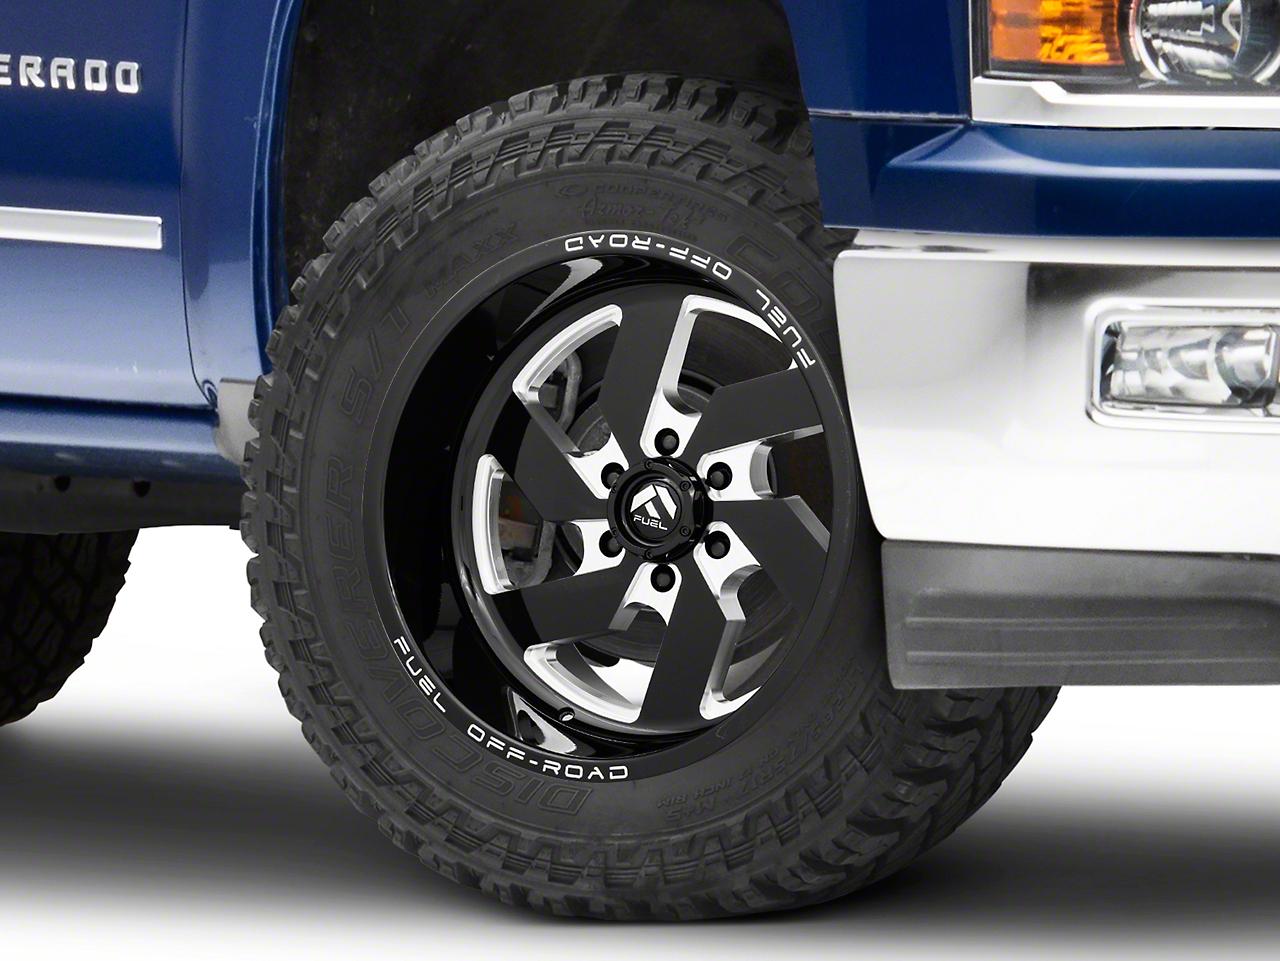 Fuel Wheels Turbo Black Milled 6-Lug Wheel - 20x10 (99-18 Silverado 1500)